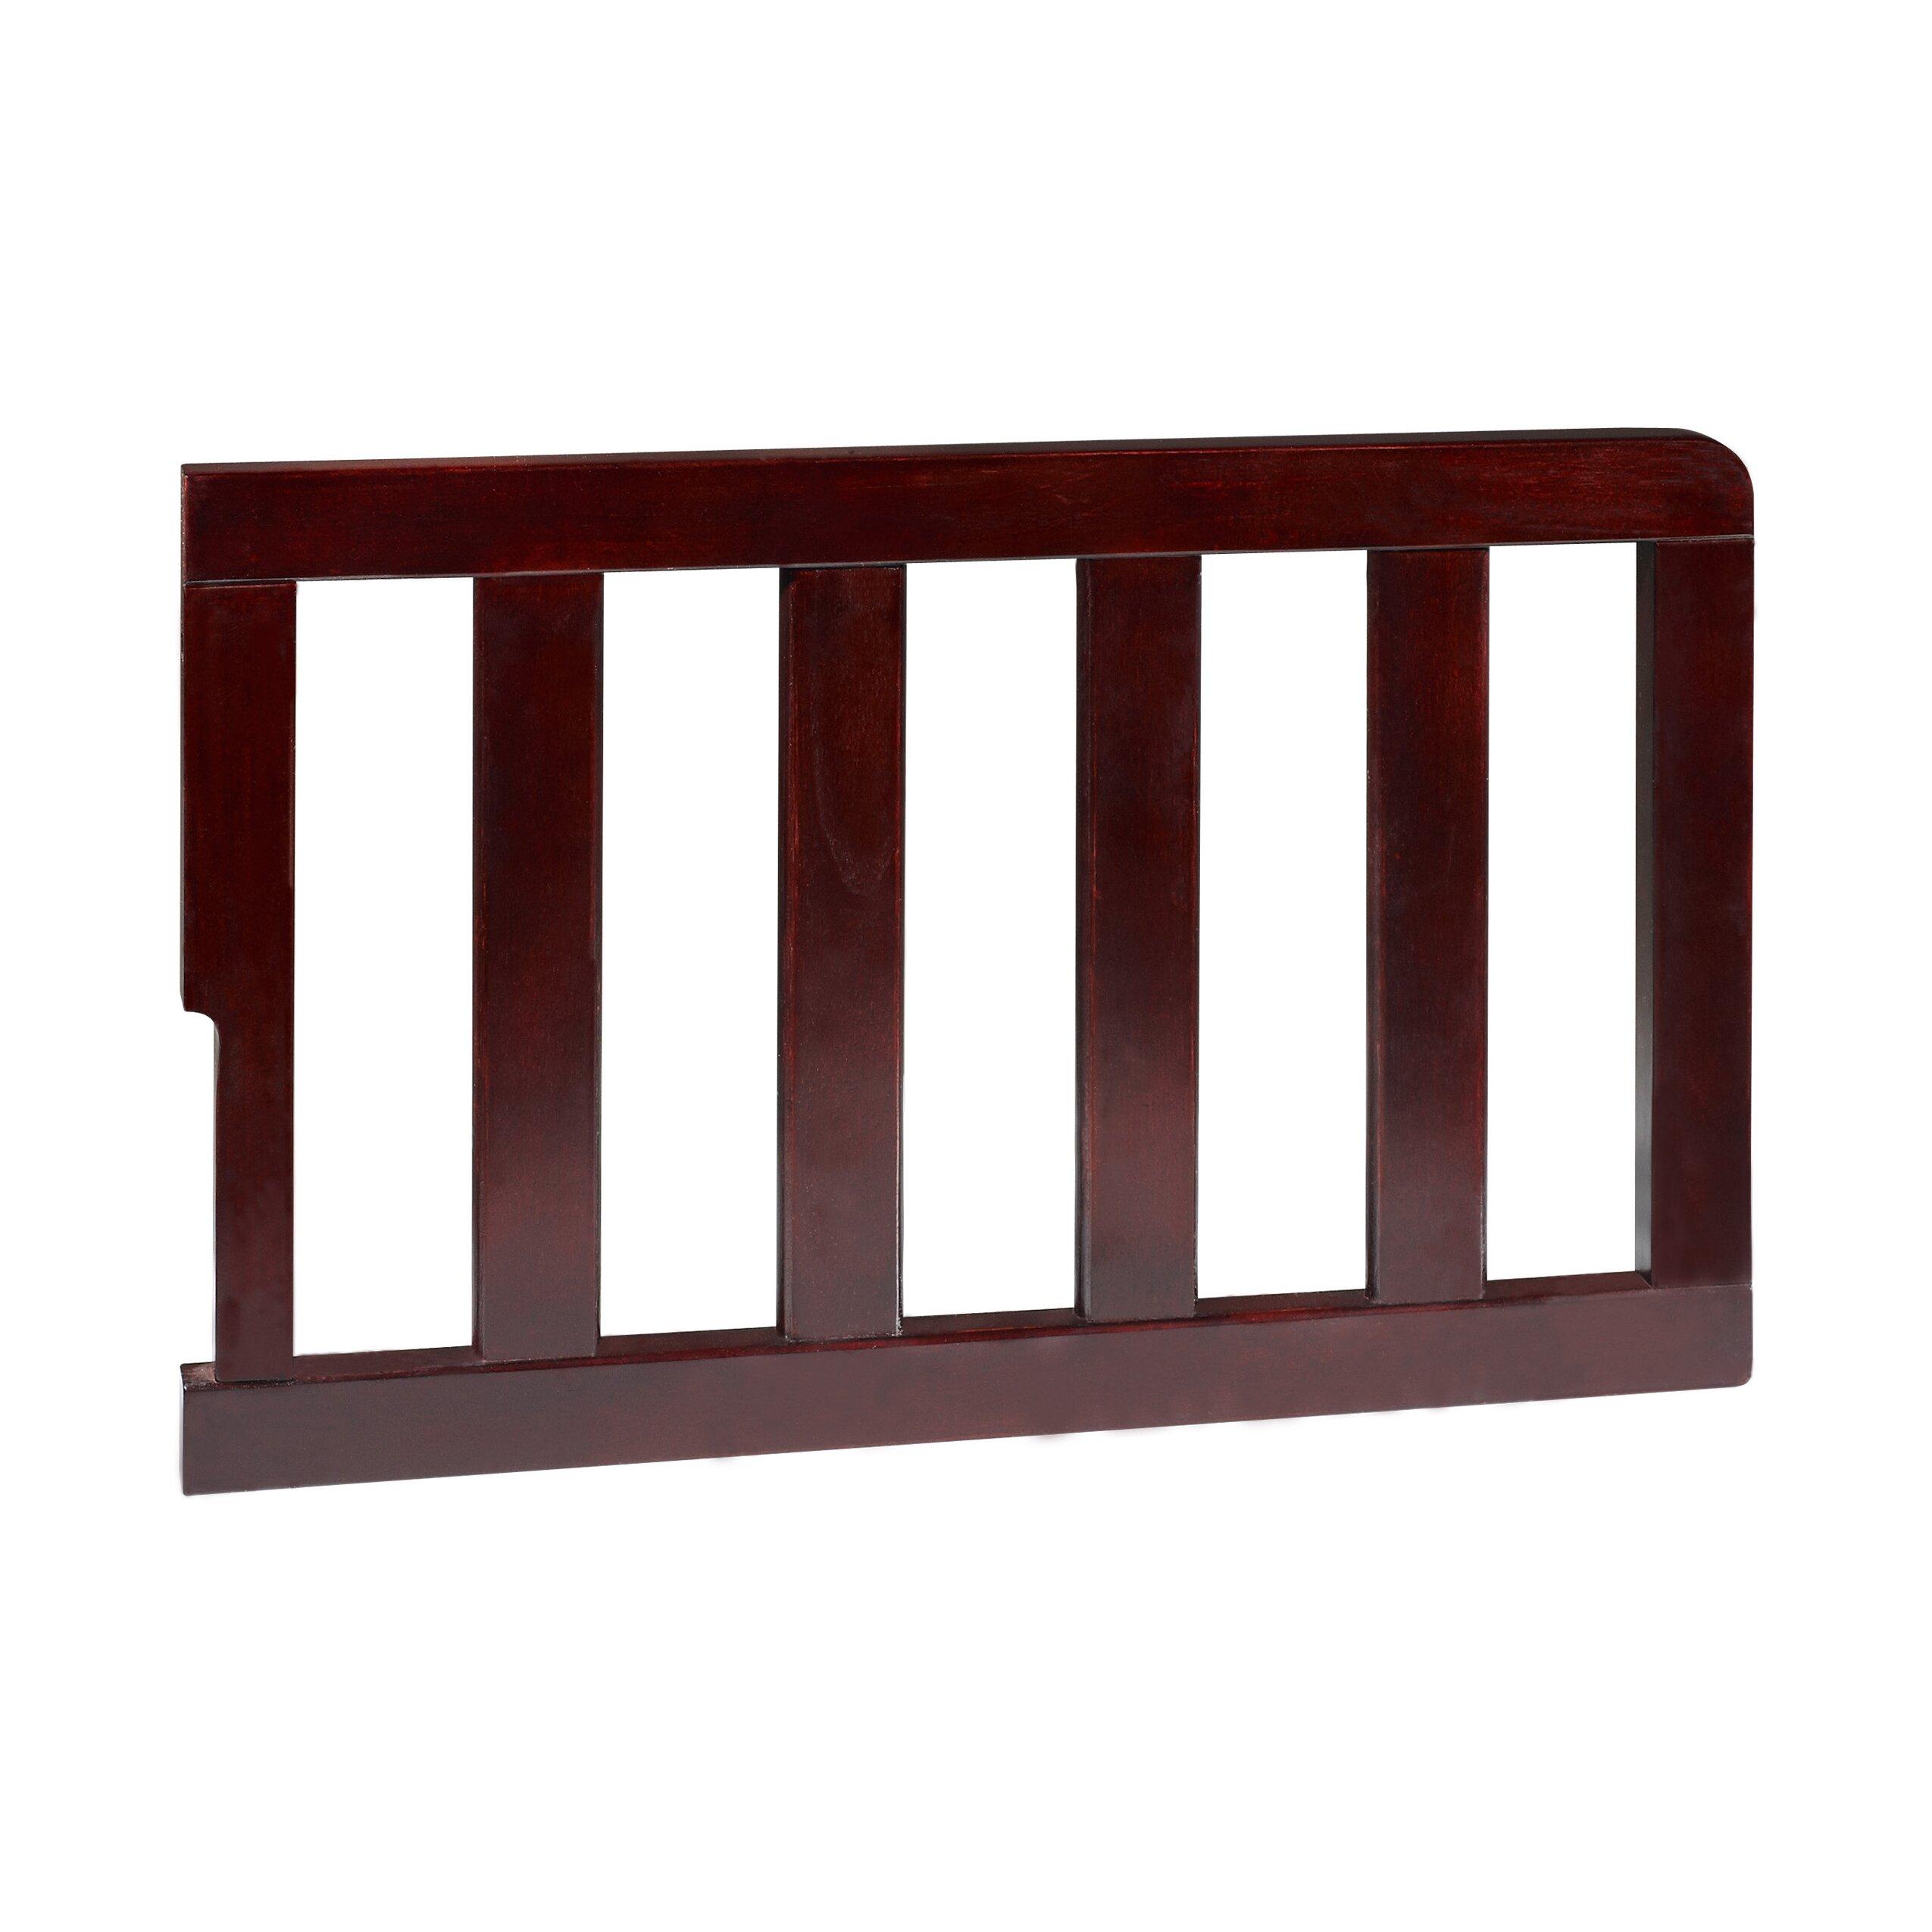 delta children toddler bed guard rail reviews wayfair. Black Bedroom Furniture Sets. Home Design Ideas